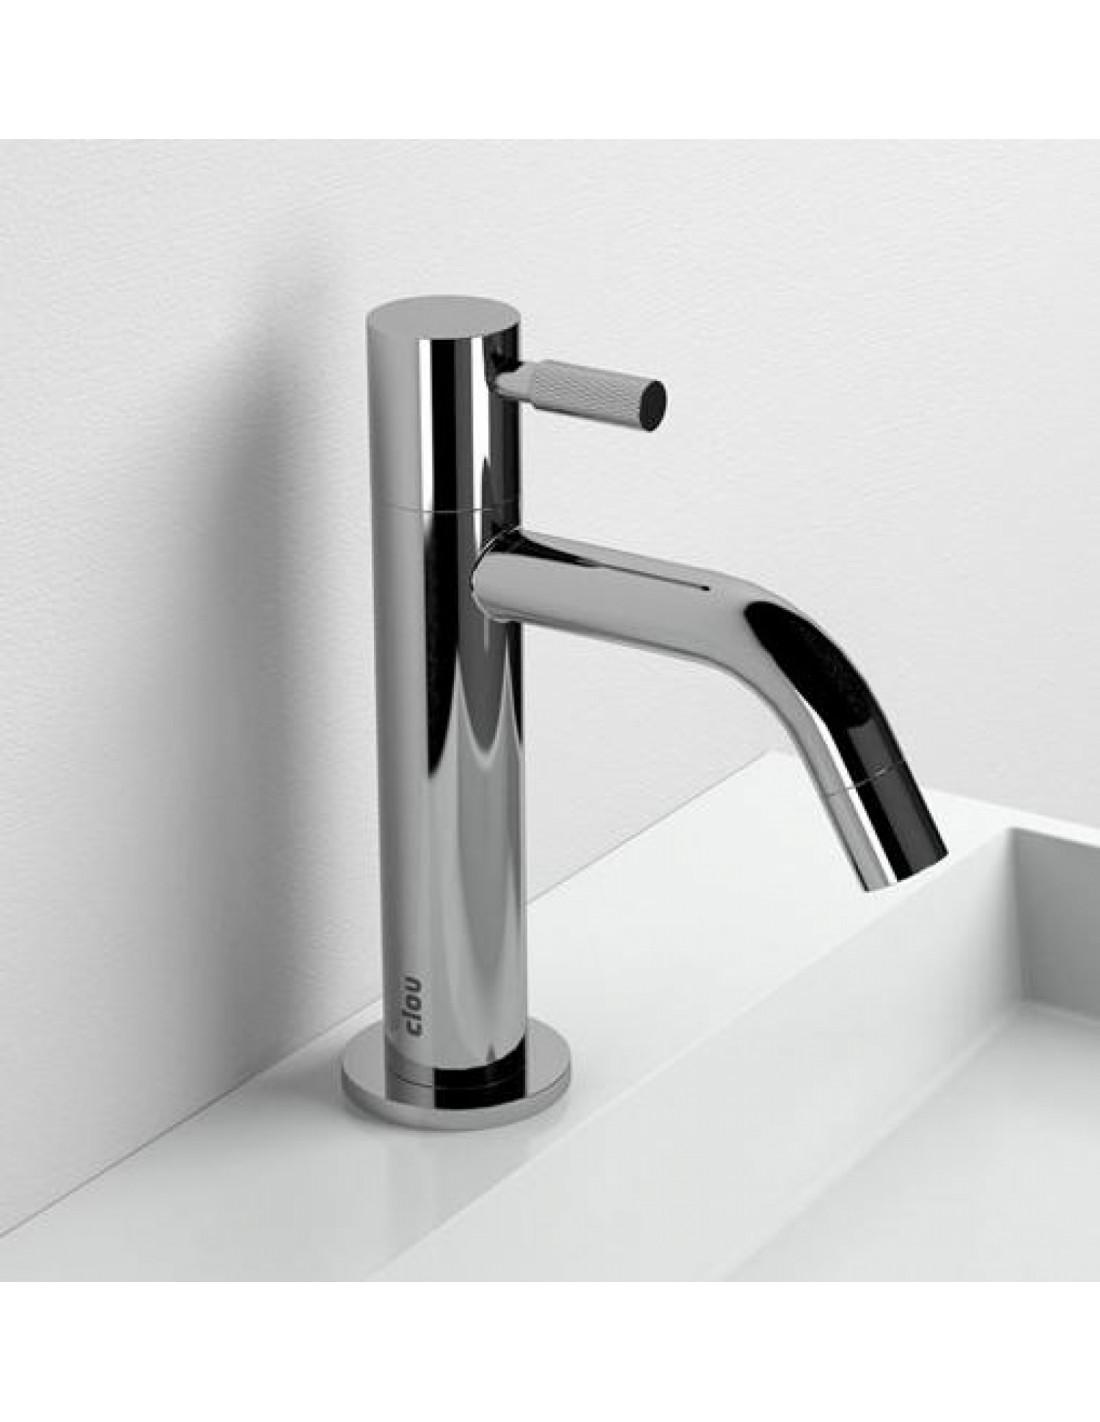 robinet eau froide freddo 2 chrom pour la marque clou. Black Bedroom Furniture Sets. Home Design Ideas